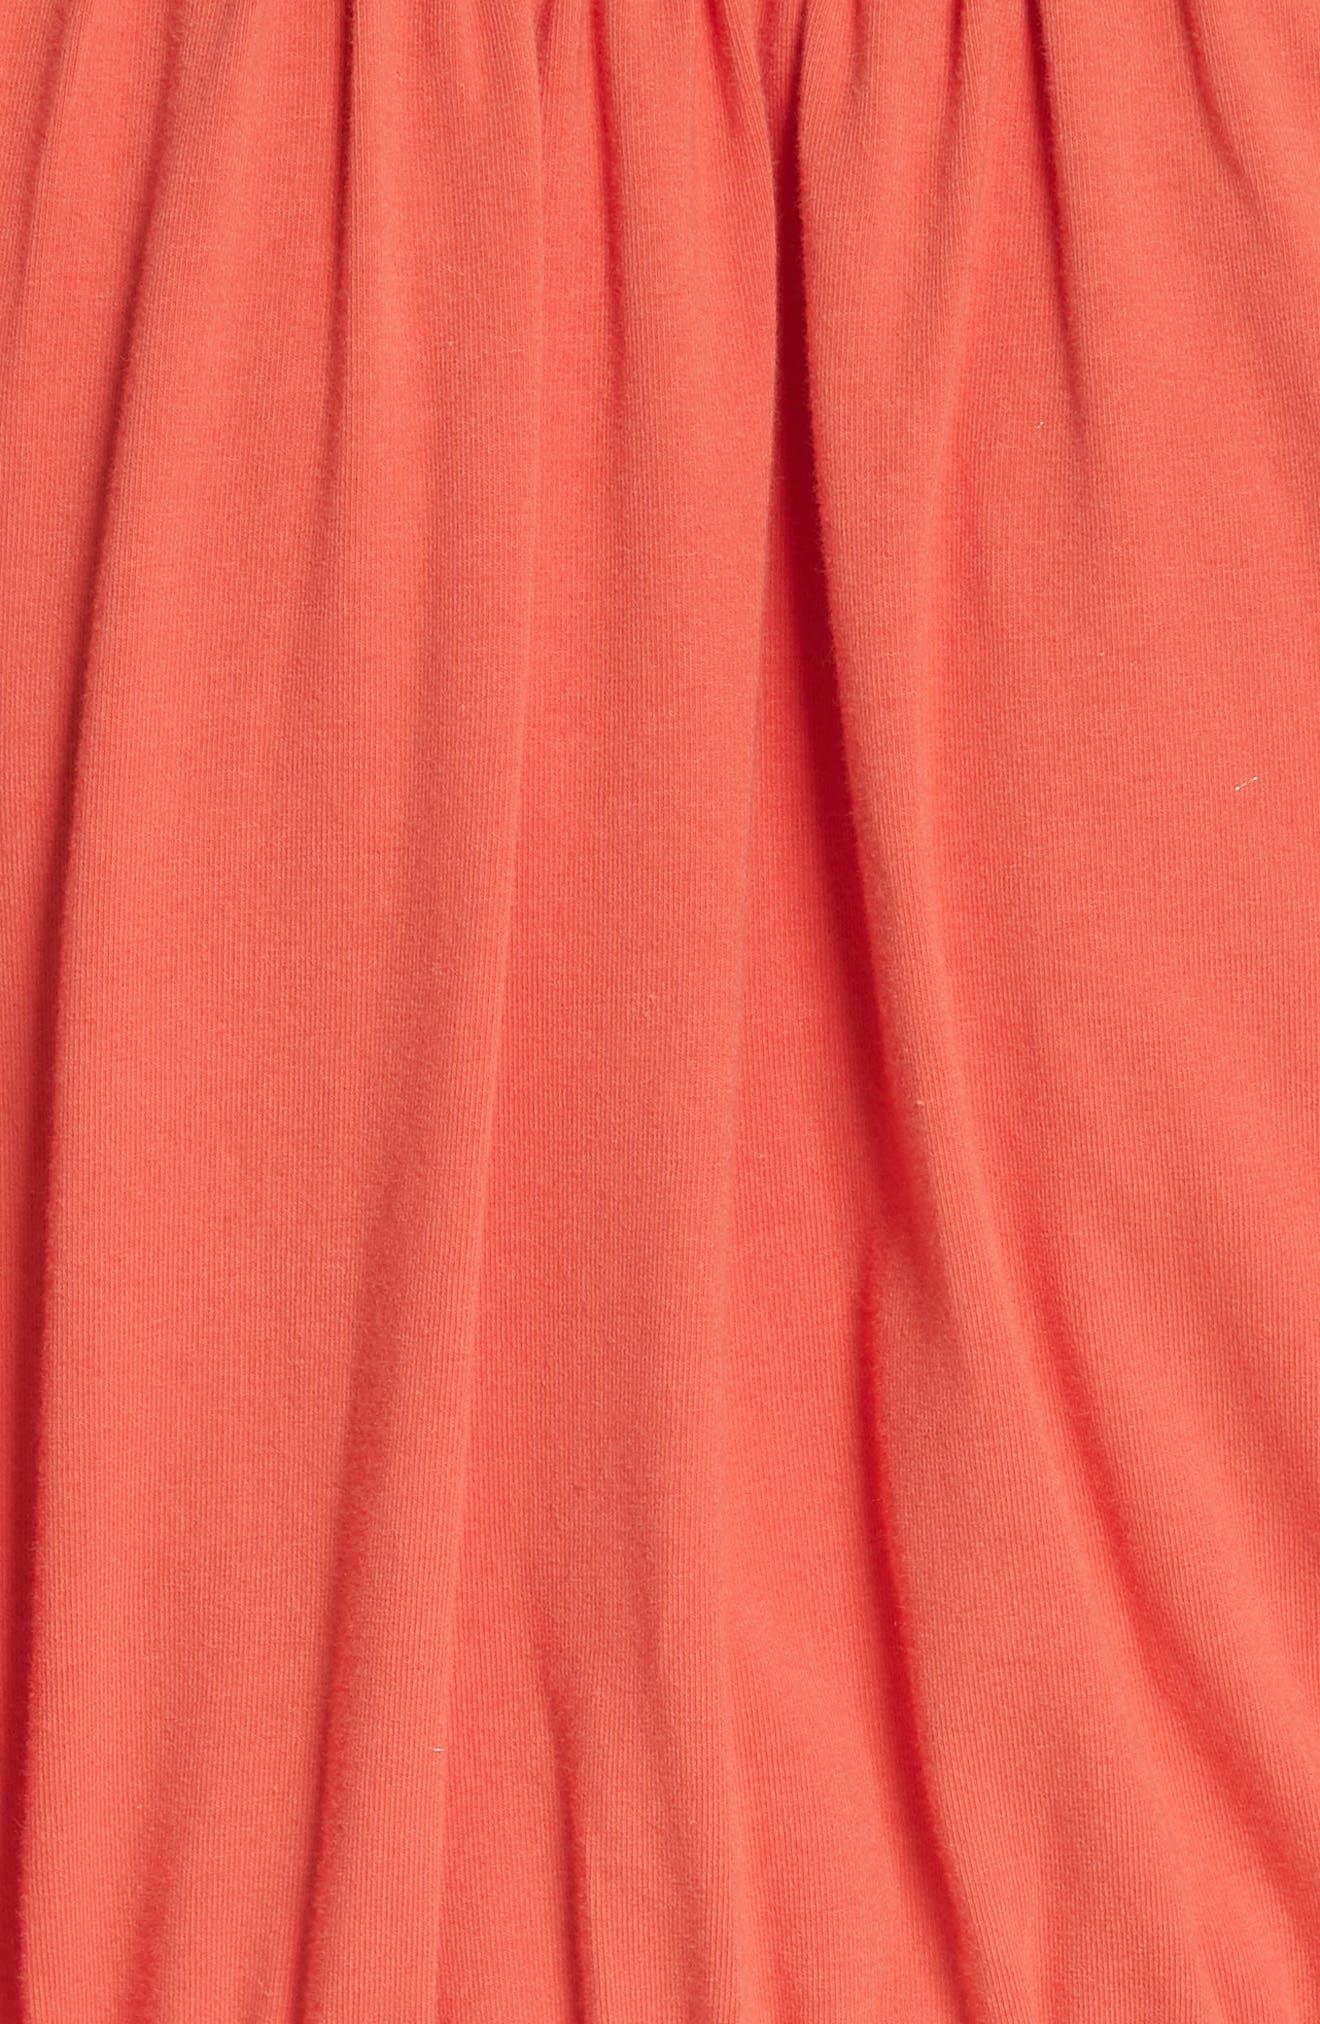 Corseted Peasant Dress,                             Alternate thumbnail 5, color,                             950